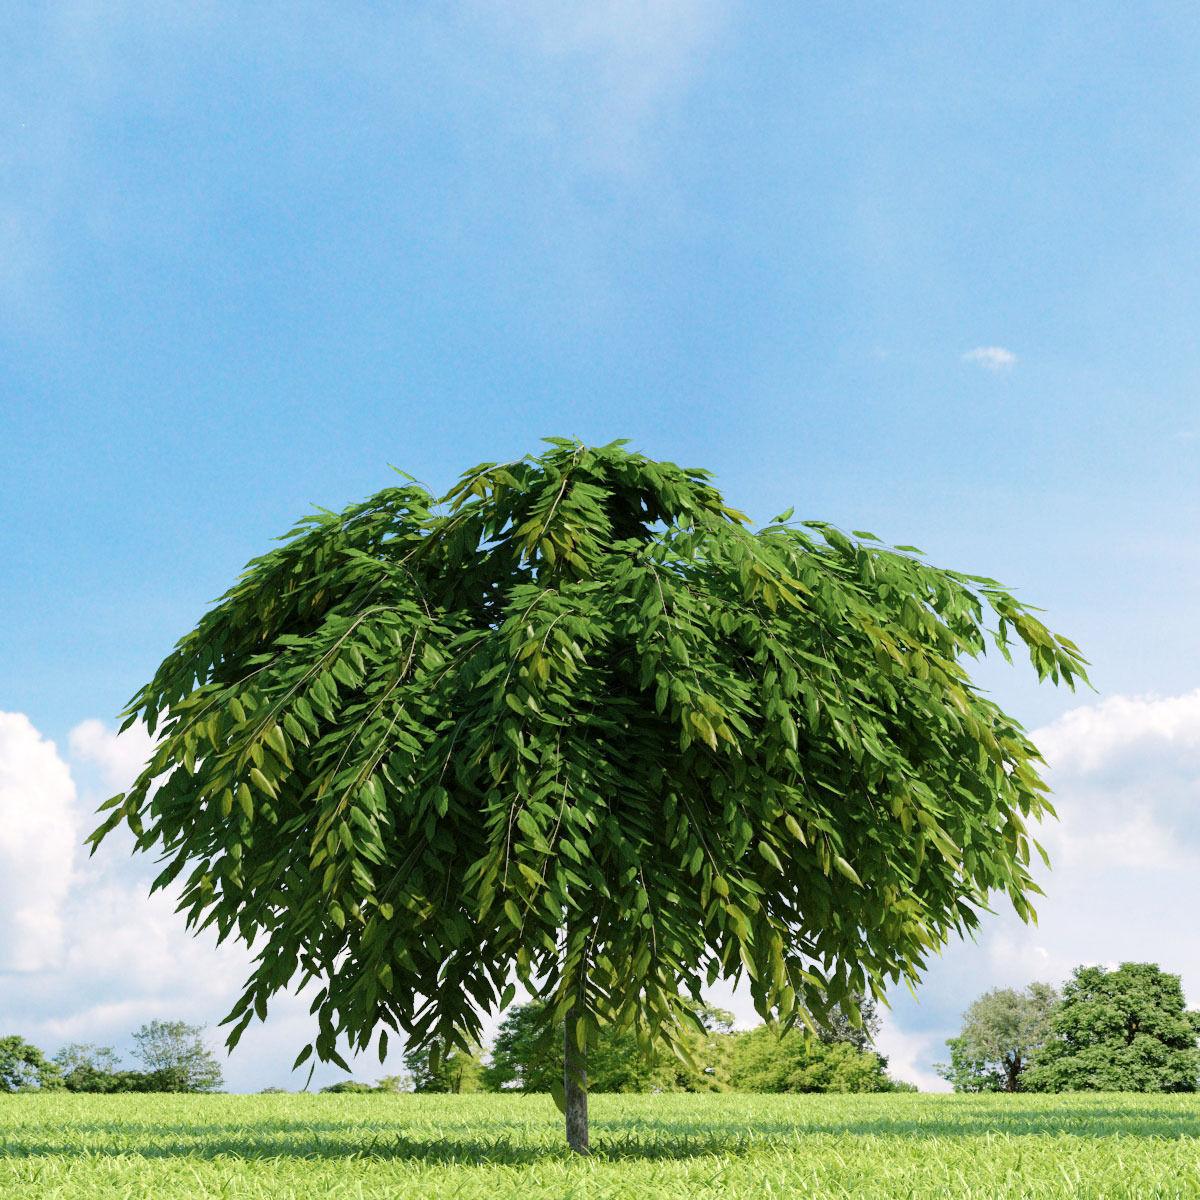 Salix repens var nitida 022 v2 AM136